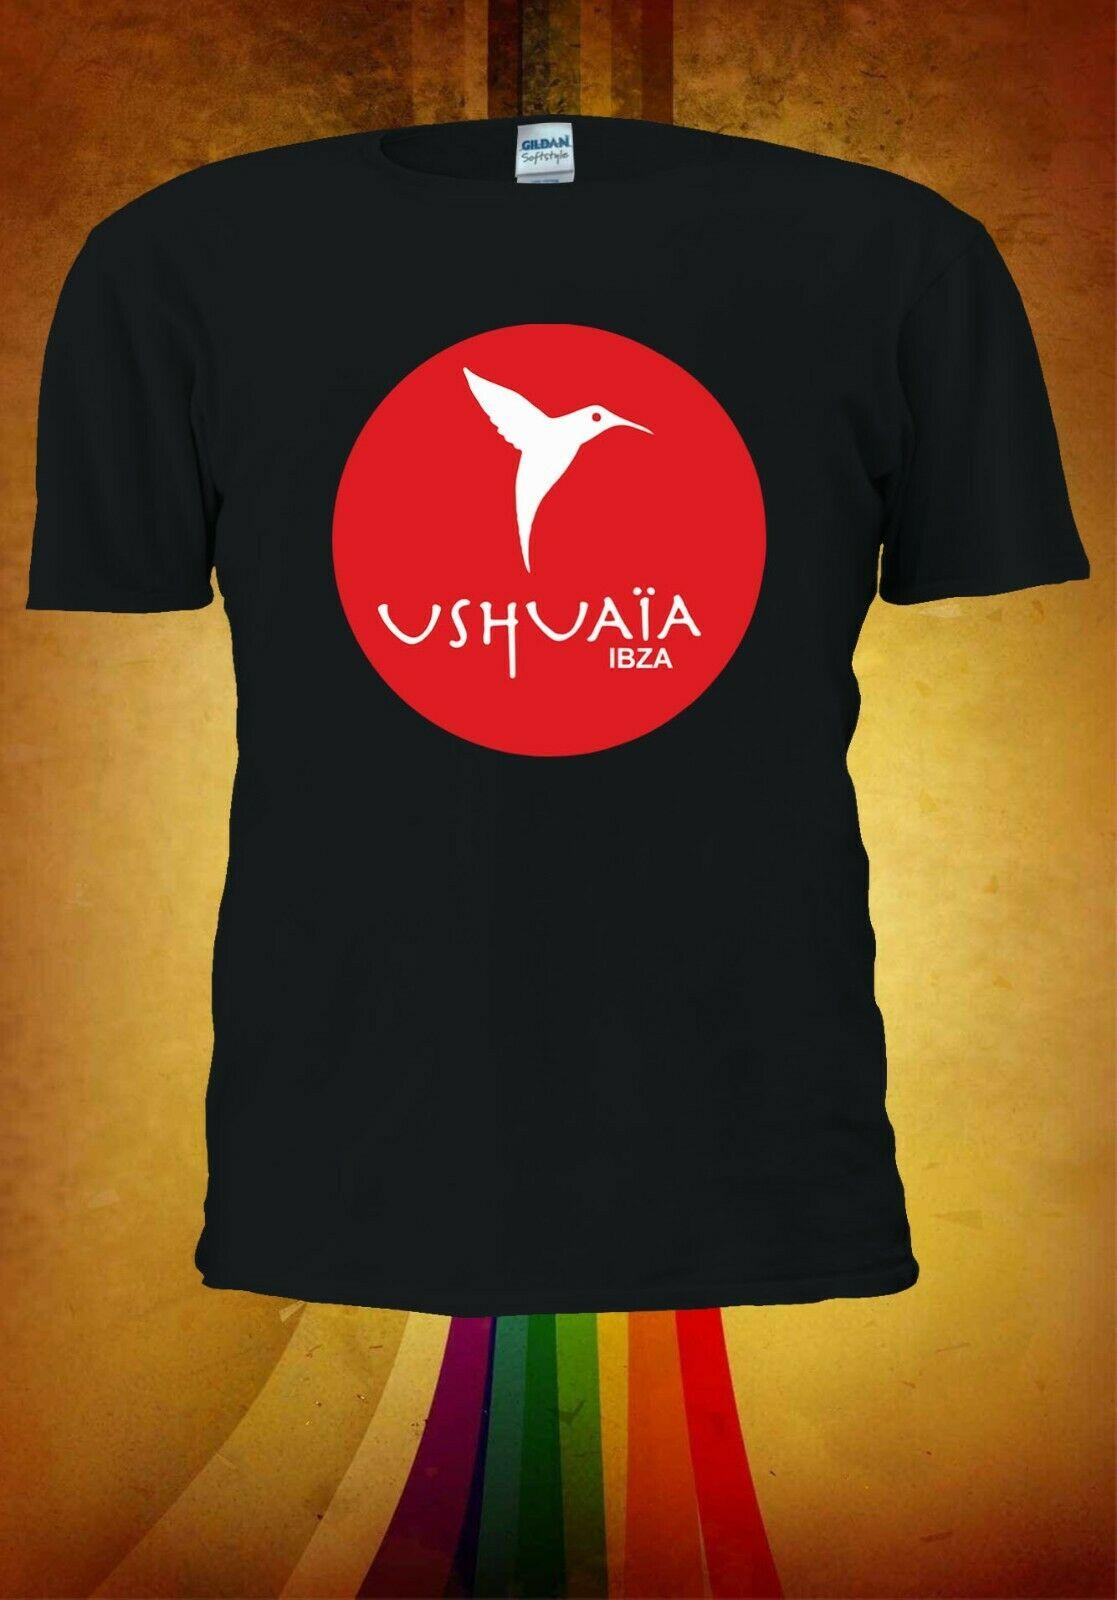 Pacha Ibiza DeepHouse Men Women Unisex TShirt T-shirt Vest Baseball Hoodie 2968